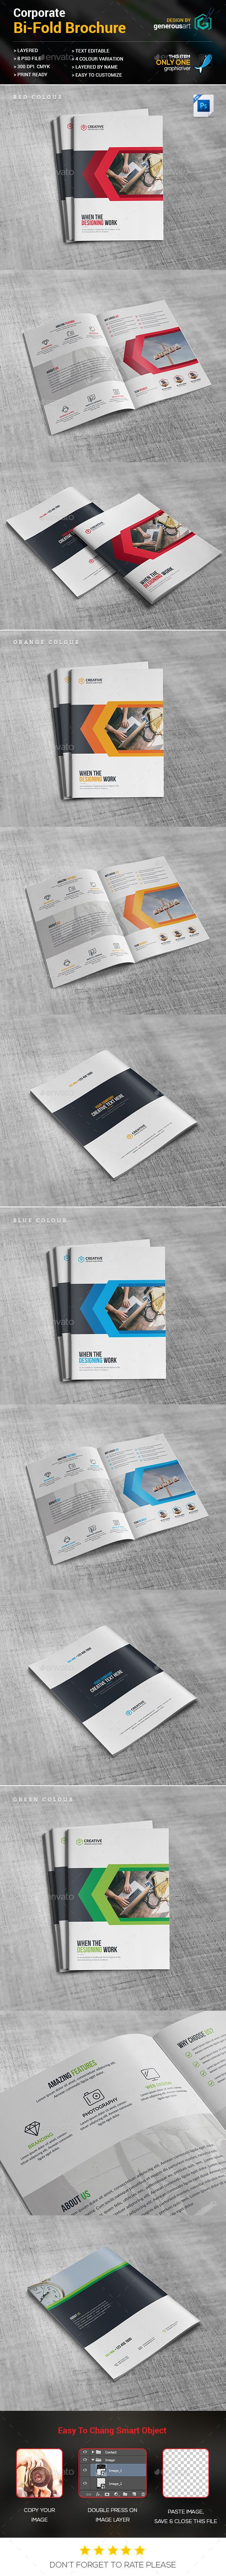 Business Bi-Fold Brochure Template PSD. Download here: http://graphicriver.net/item/business-bifold-brochure/16922781?ref=ksioks